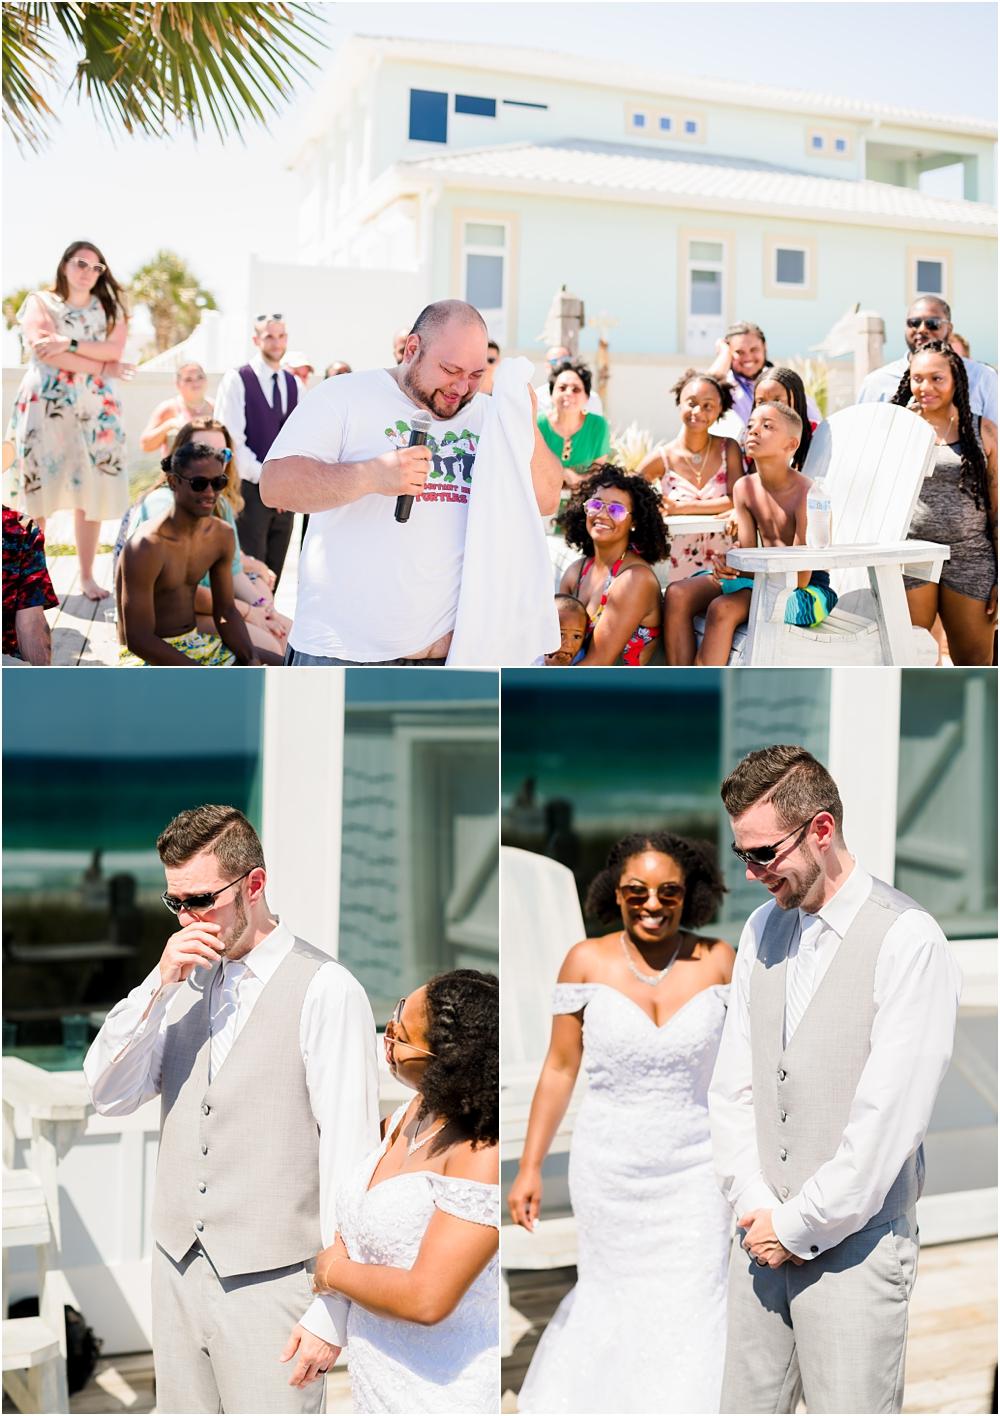 kelsey-panama-city-beach-florida-wedding-kiersten-stevenson-photography (543 of 580).jpg